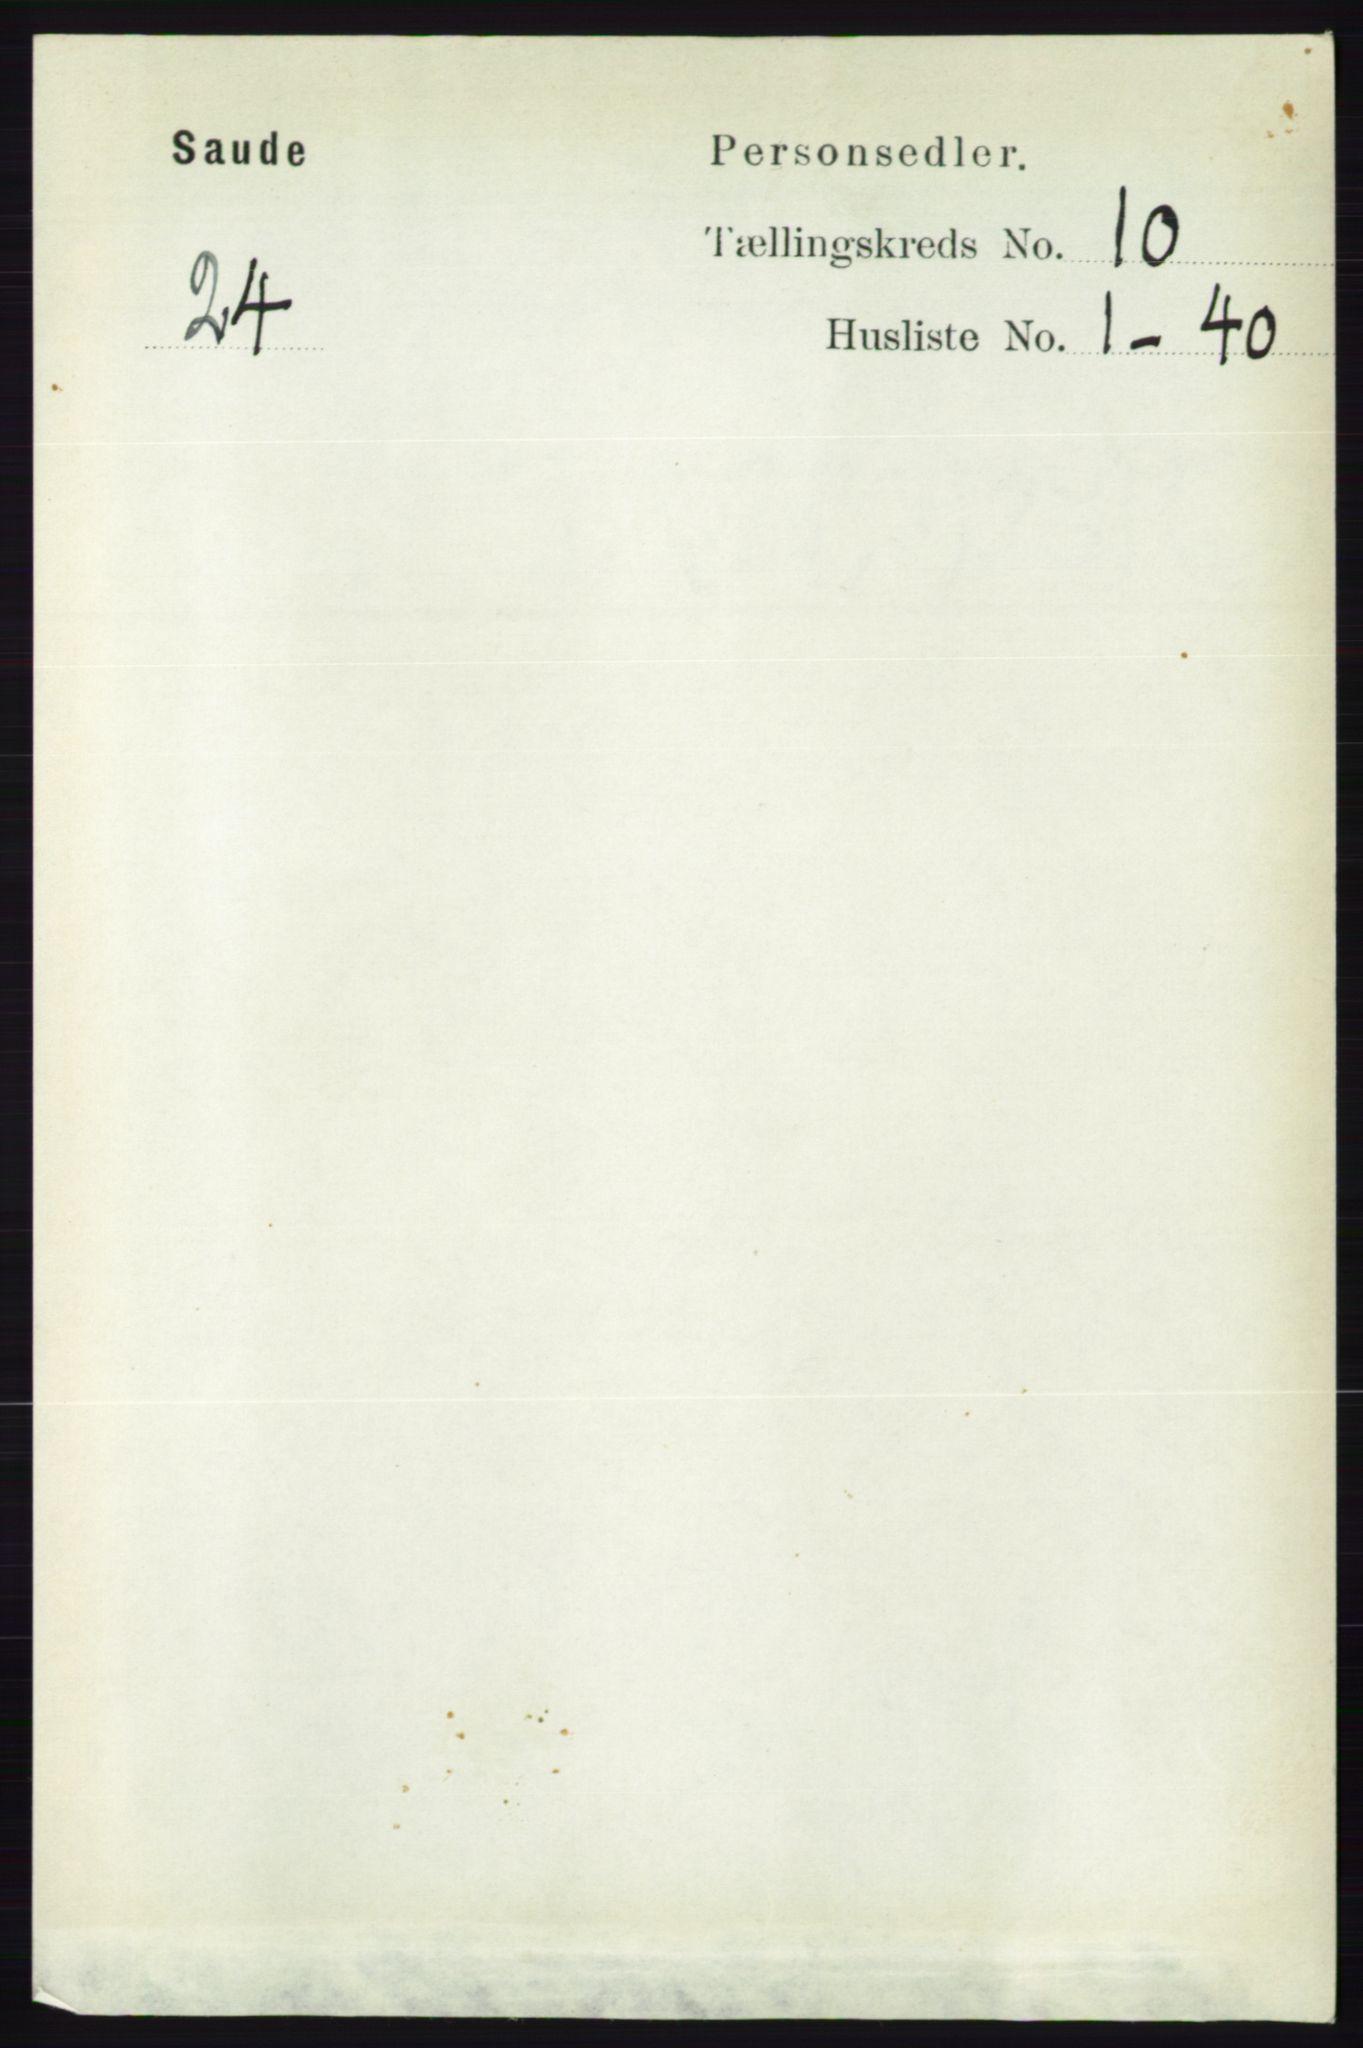 RA, Folketelling 1891 for 0822 Sauherad herred, 1891, s. 3002